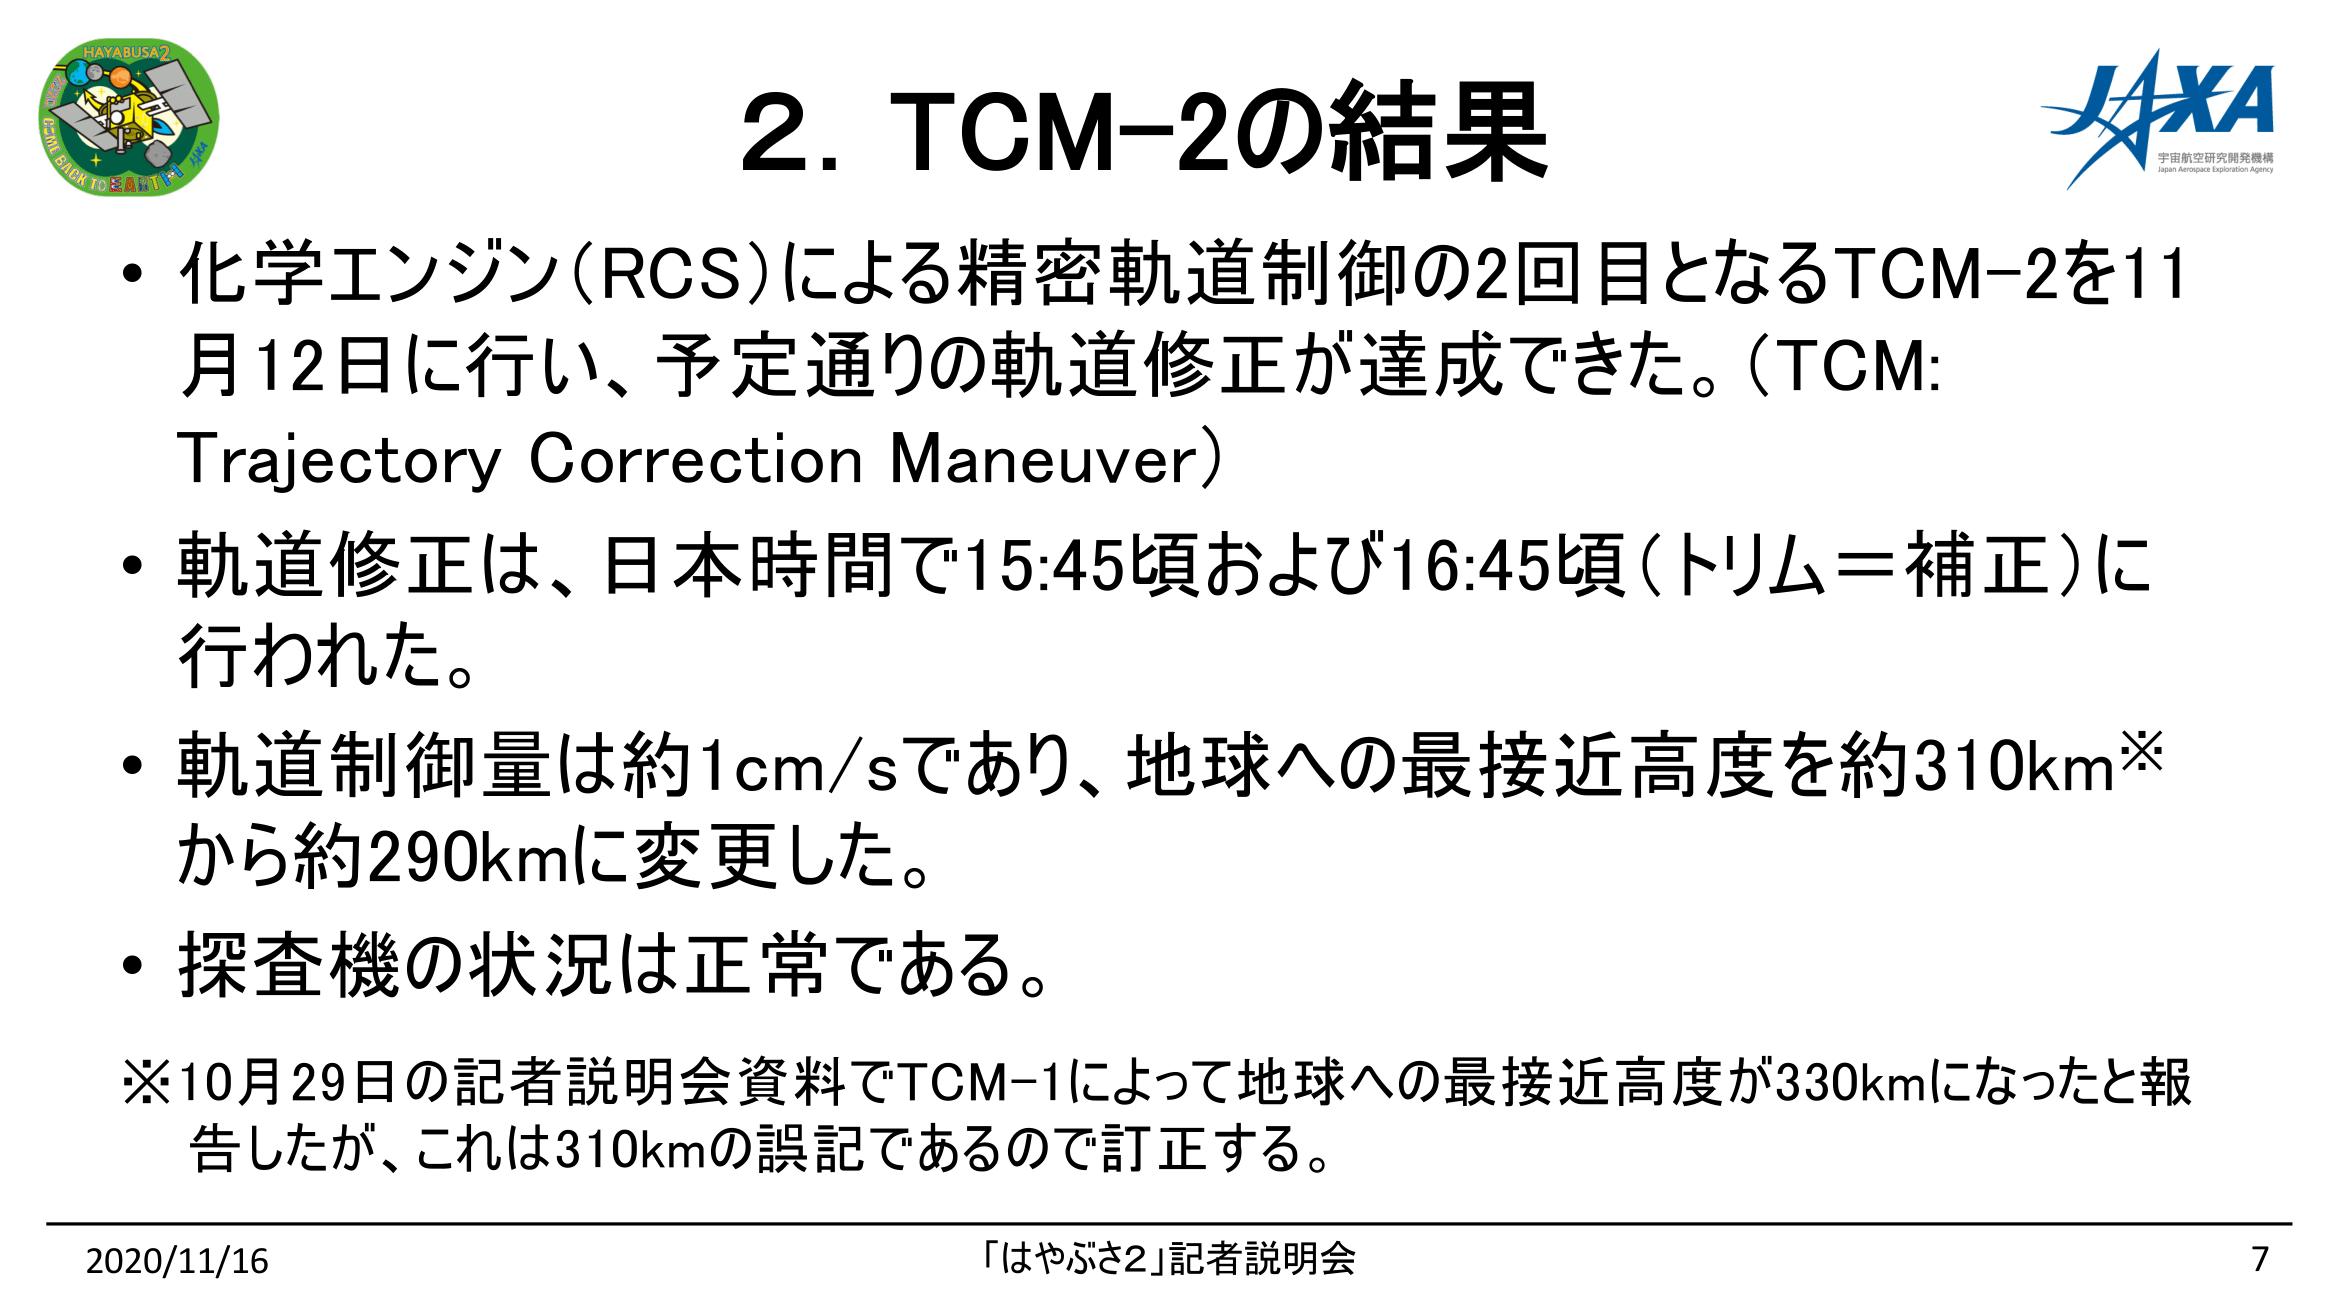 f:id:Imamura:20201116151147p:plain